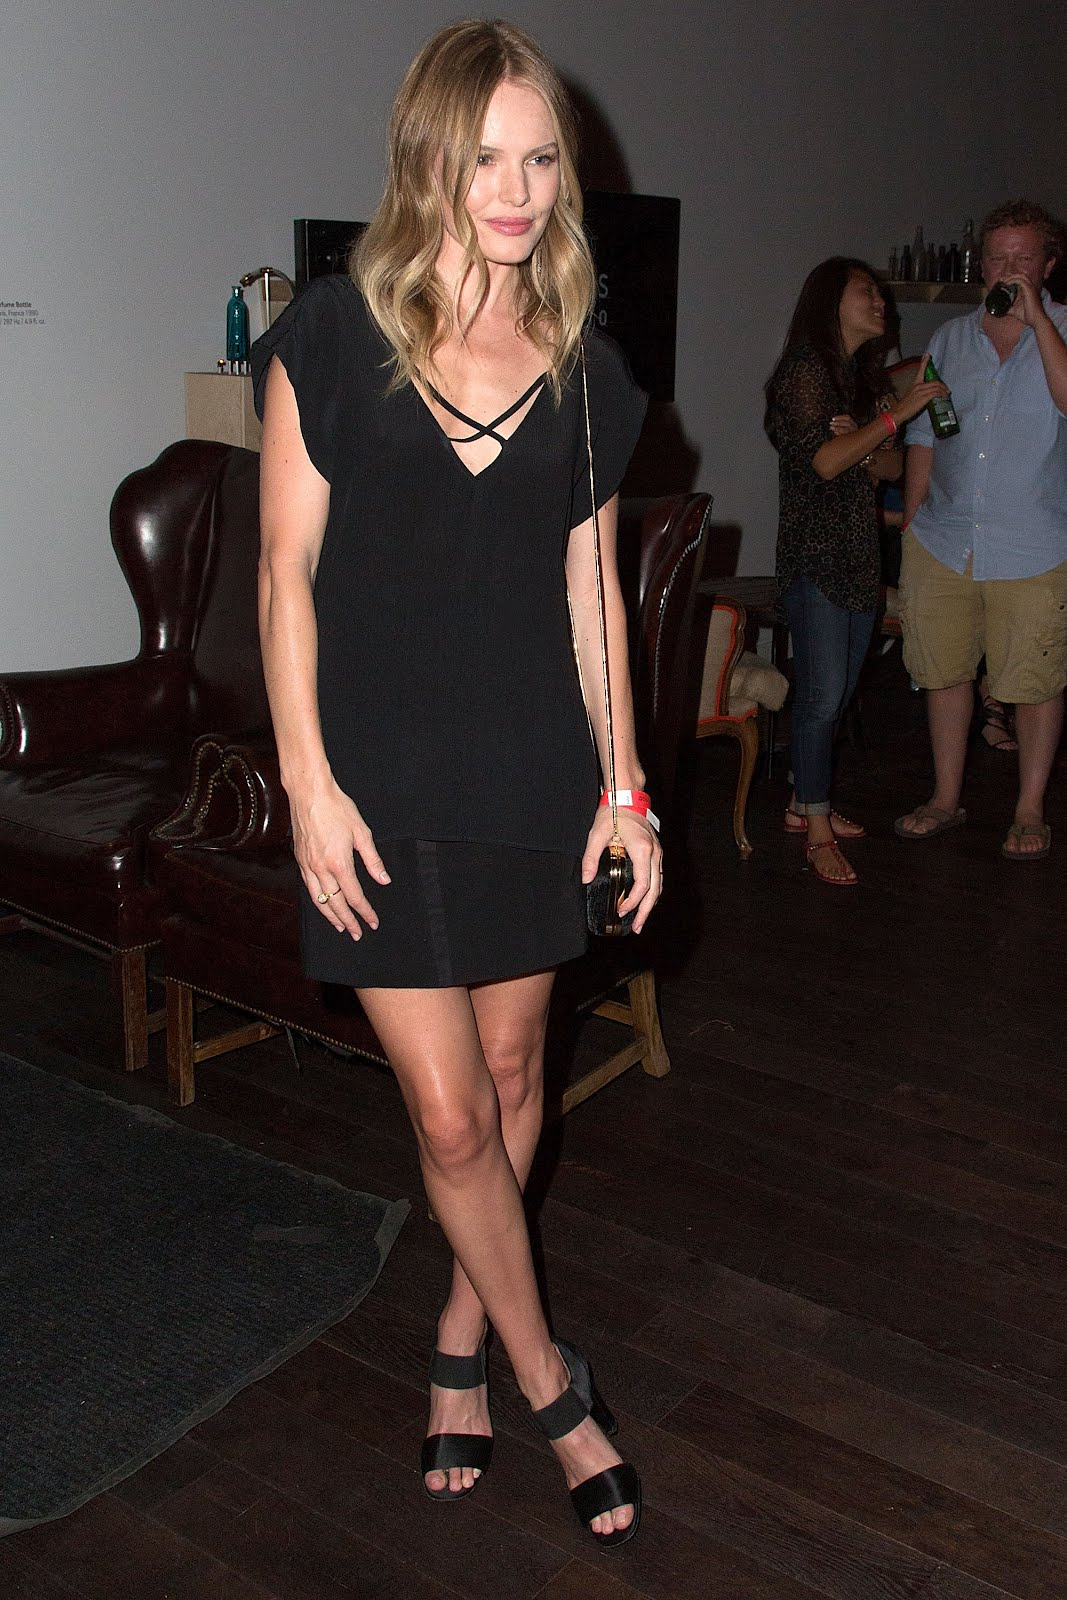 http://2.bp.blogspot.com/-l0HWYMxMv4M/UFRNiKV3ciI/AAAAAAAAAlI/FpHEZXfROE0/s1600/Kate_Bosworth_Feet_02.jpg